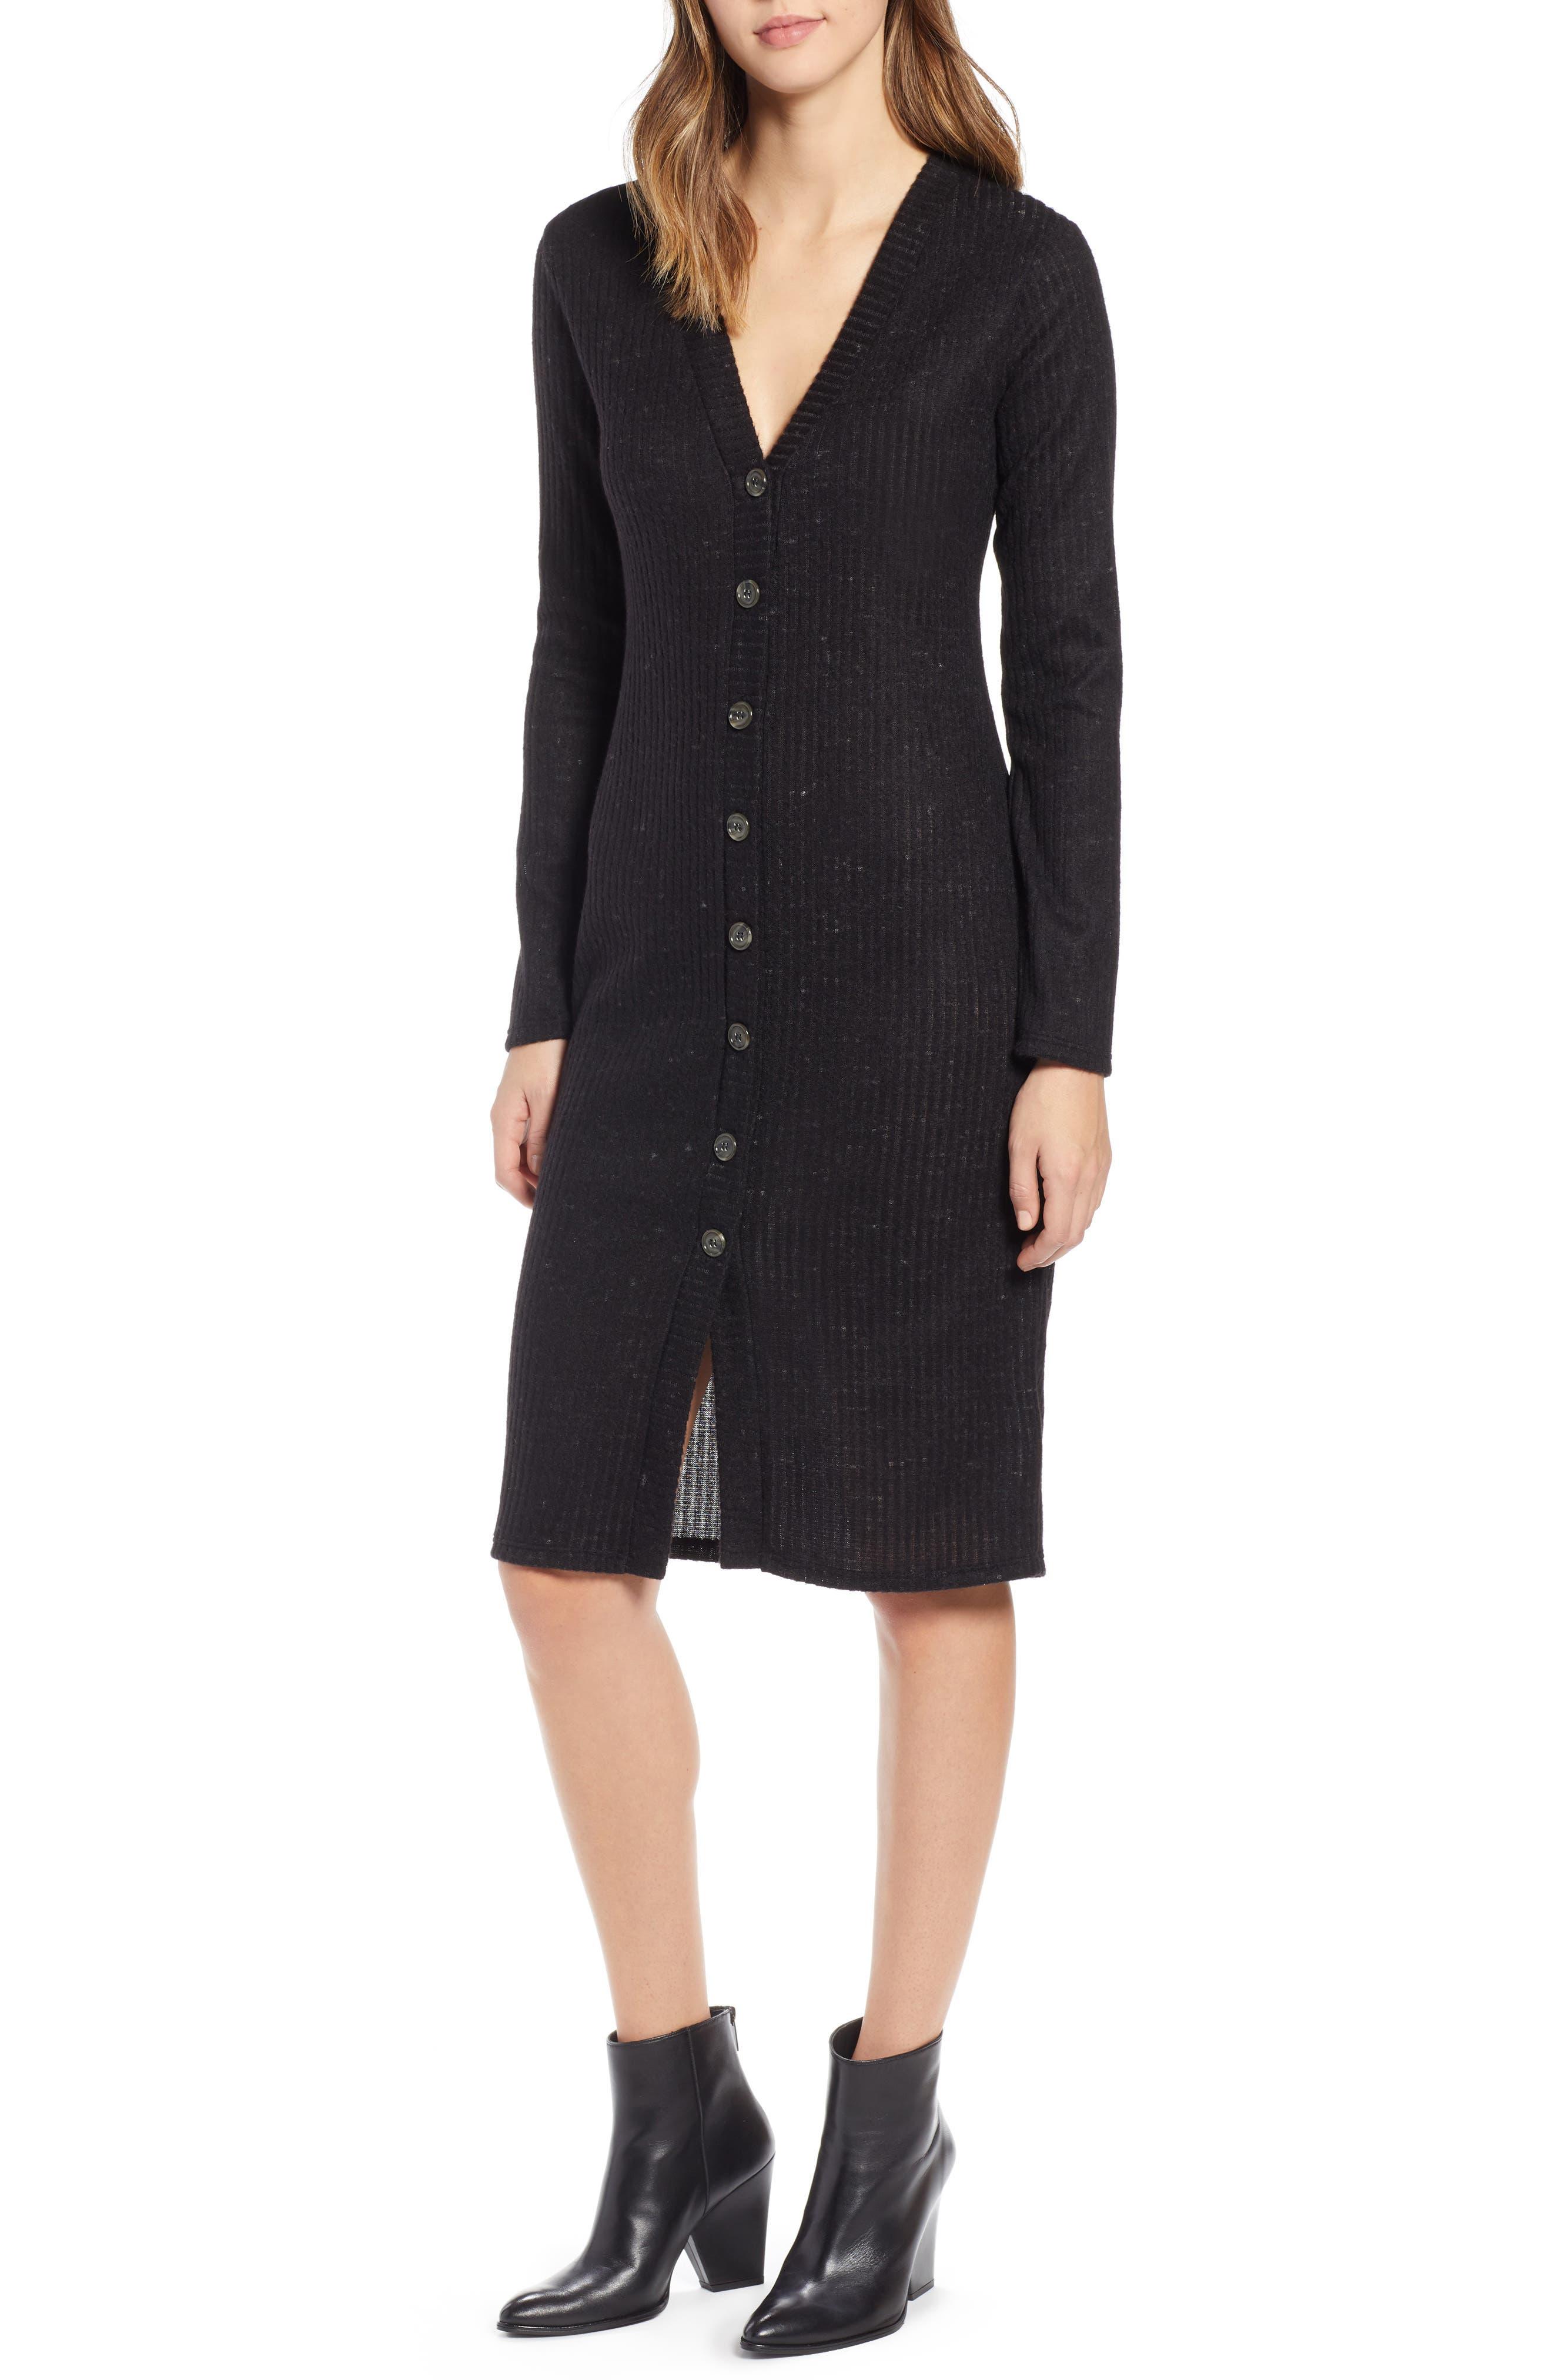 SOCIALITE,                             Sweater Dress,                             Main thumbnail 1, color,                             BLACK